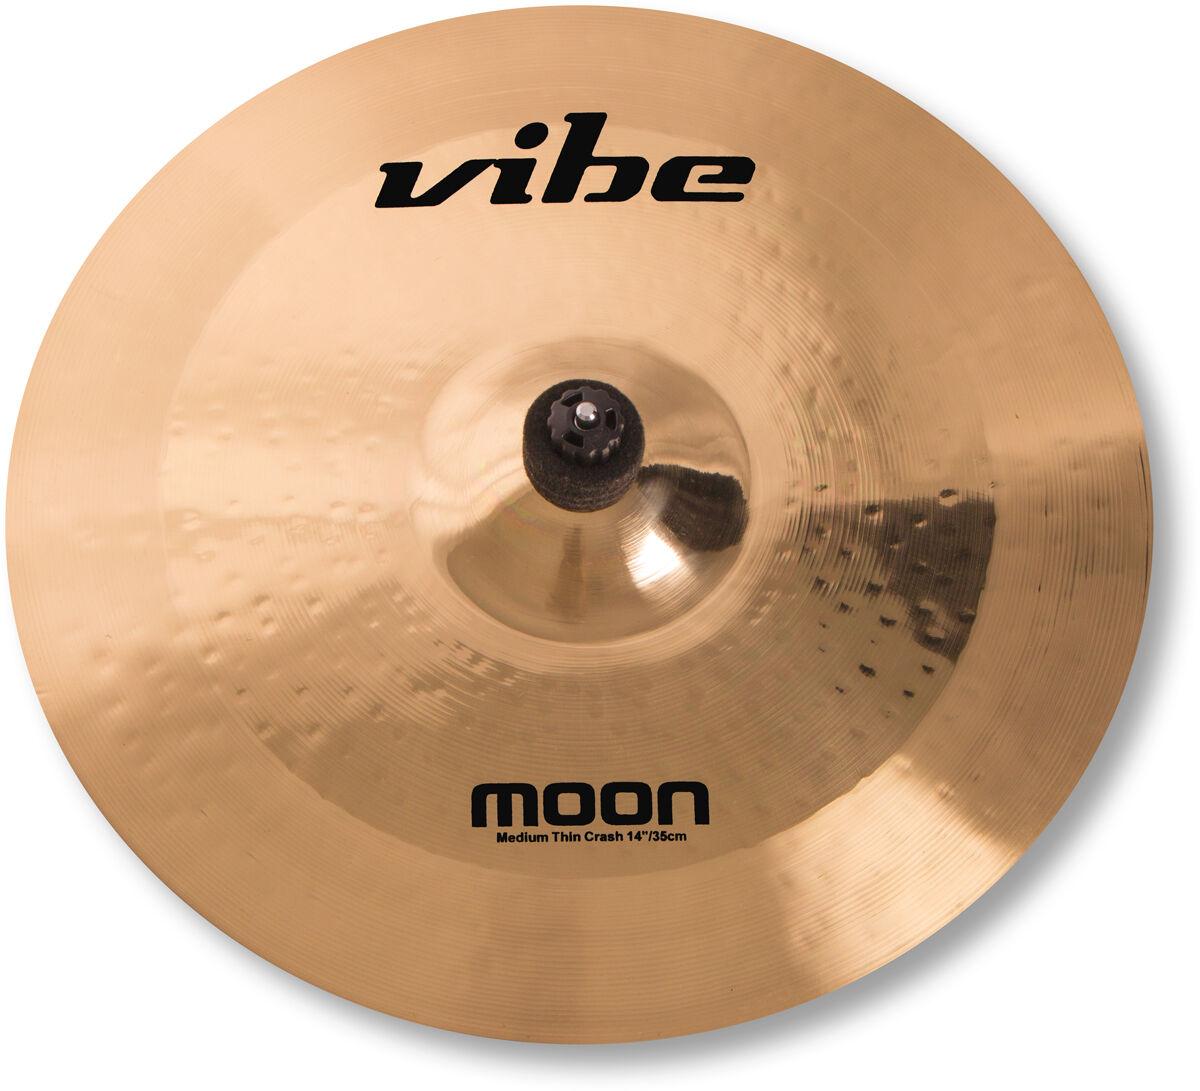 14  Vibe Moon Brilliant Medium Thin Crash Becken Cymbal B20 mit Zertifikat